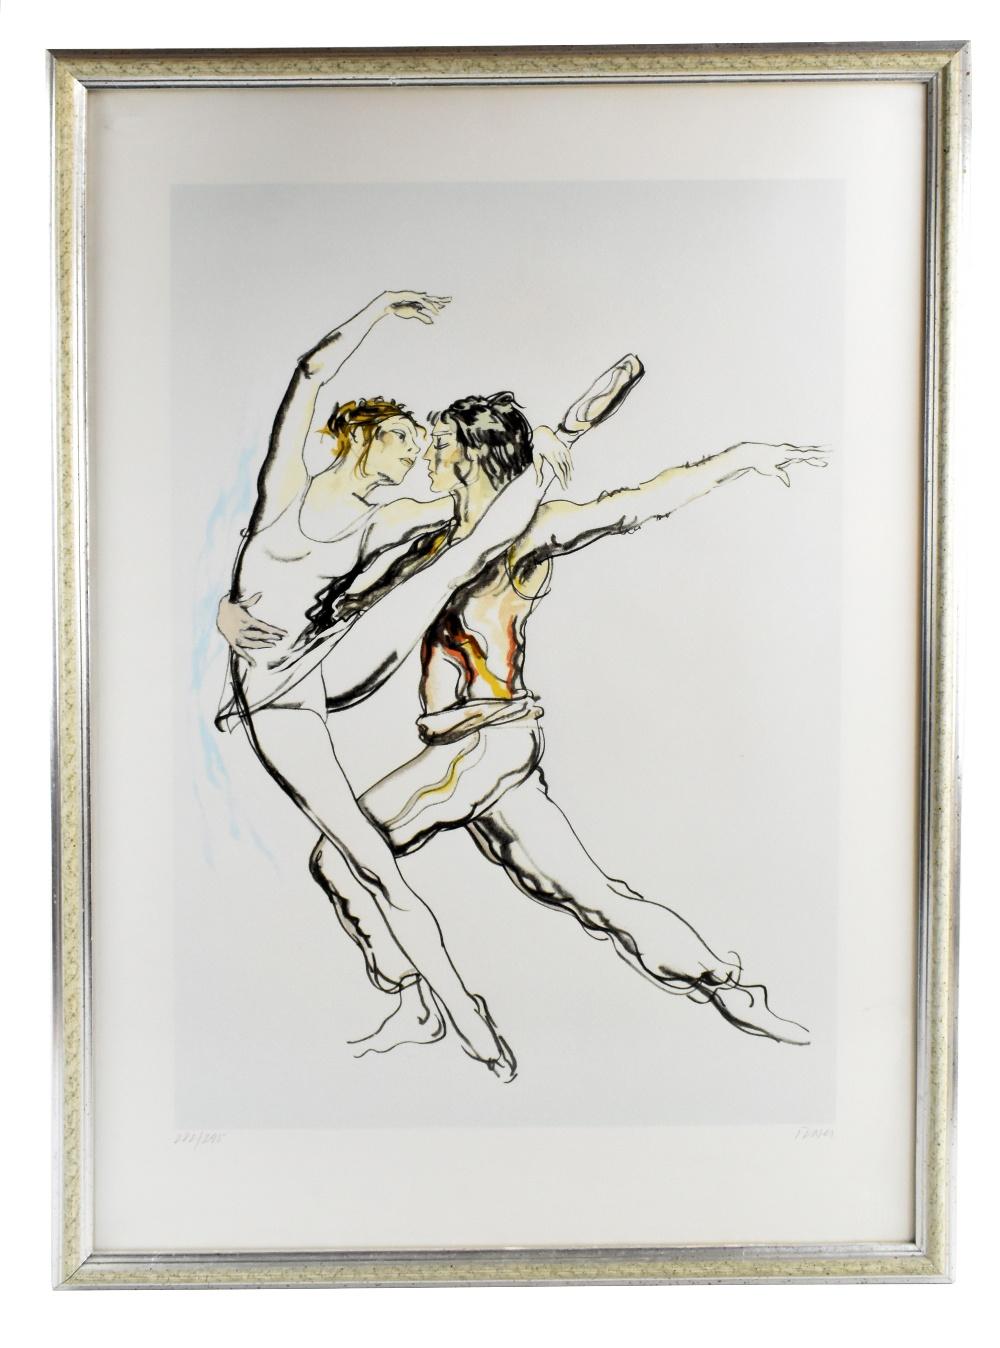 DONALD HAMILTON FRASER (Scottish, 1929-2009); pencil signed limited edition print, 'Spartacus',